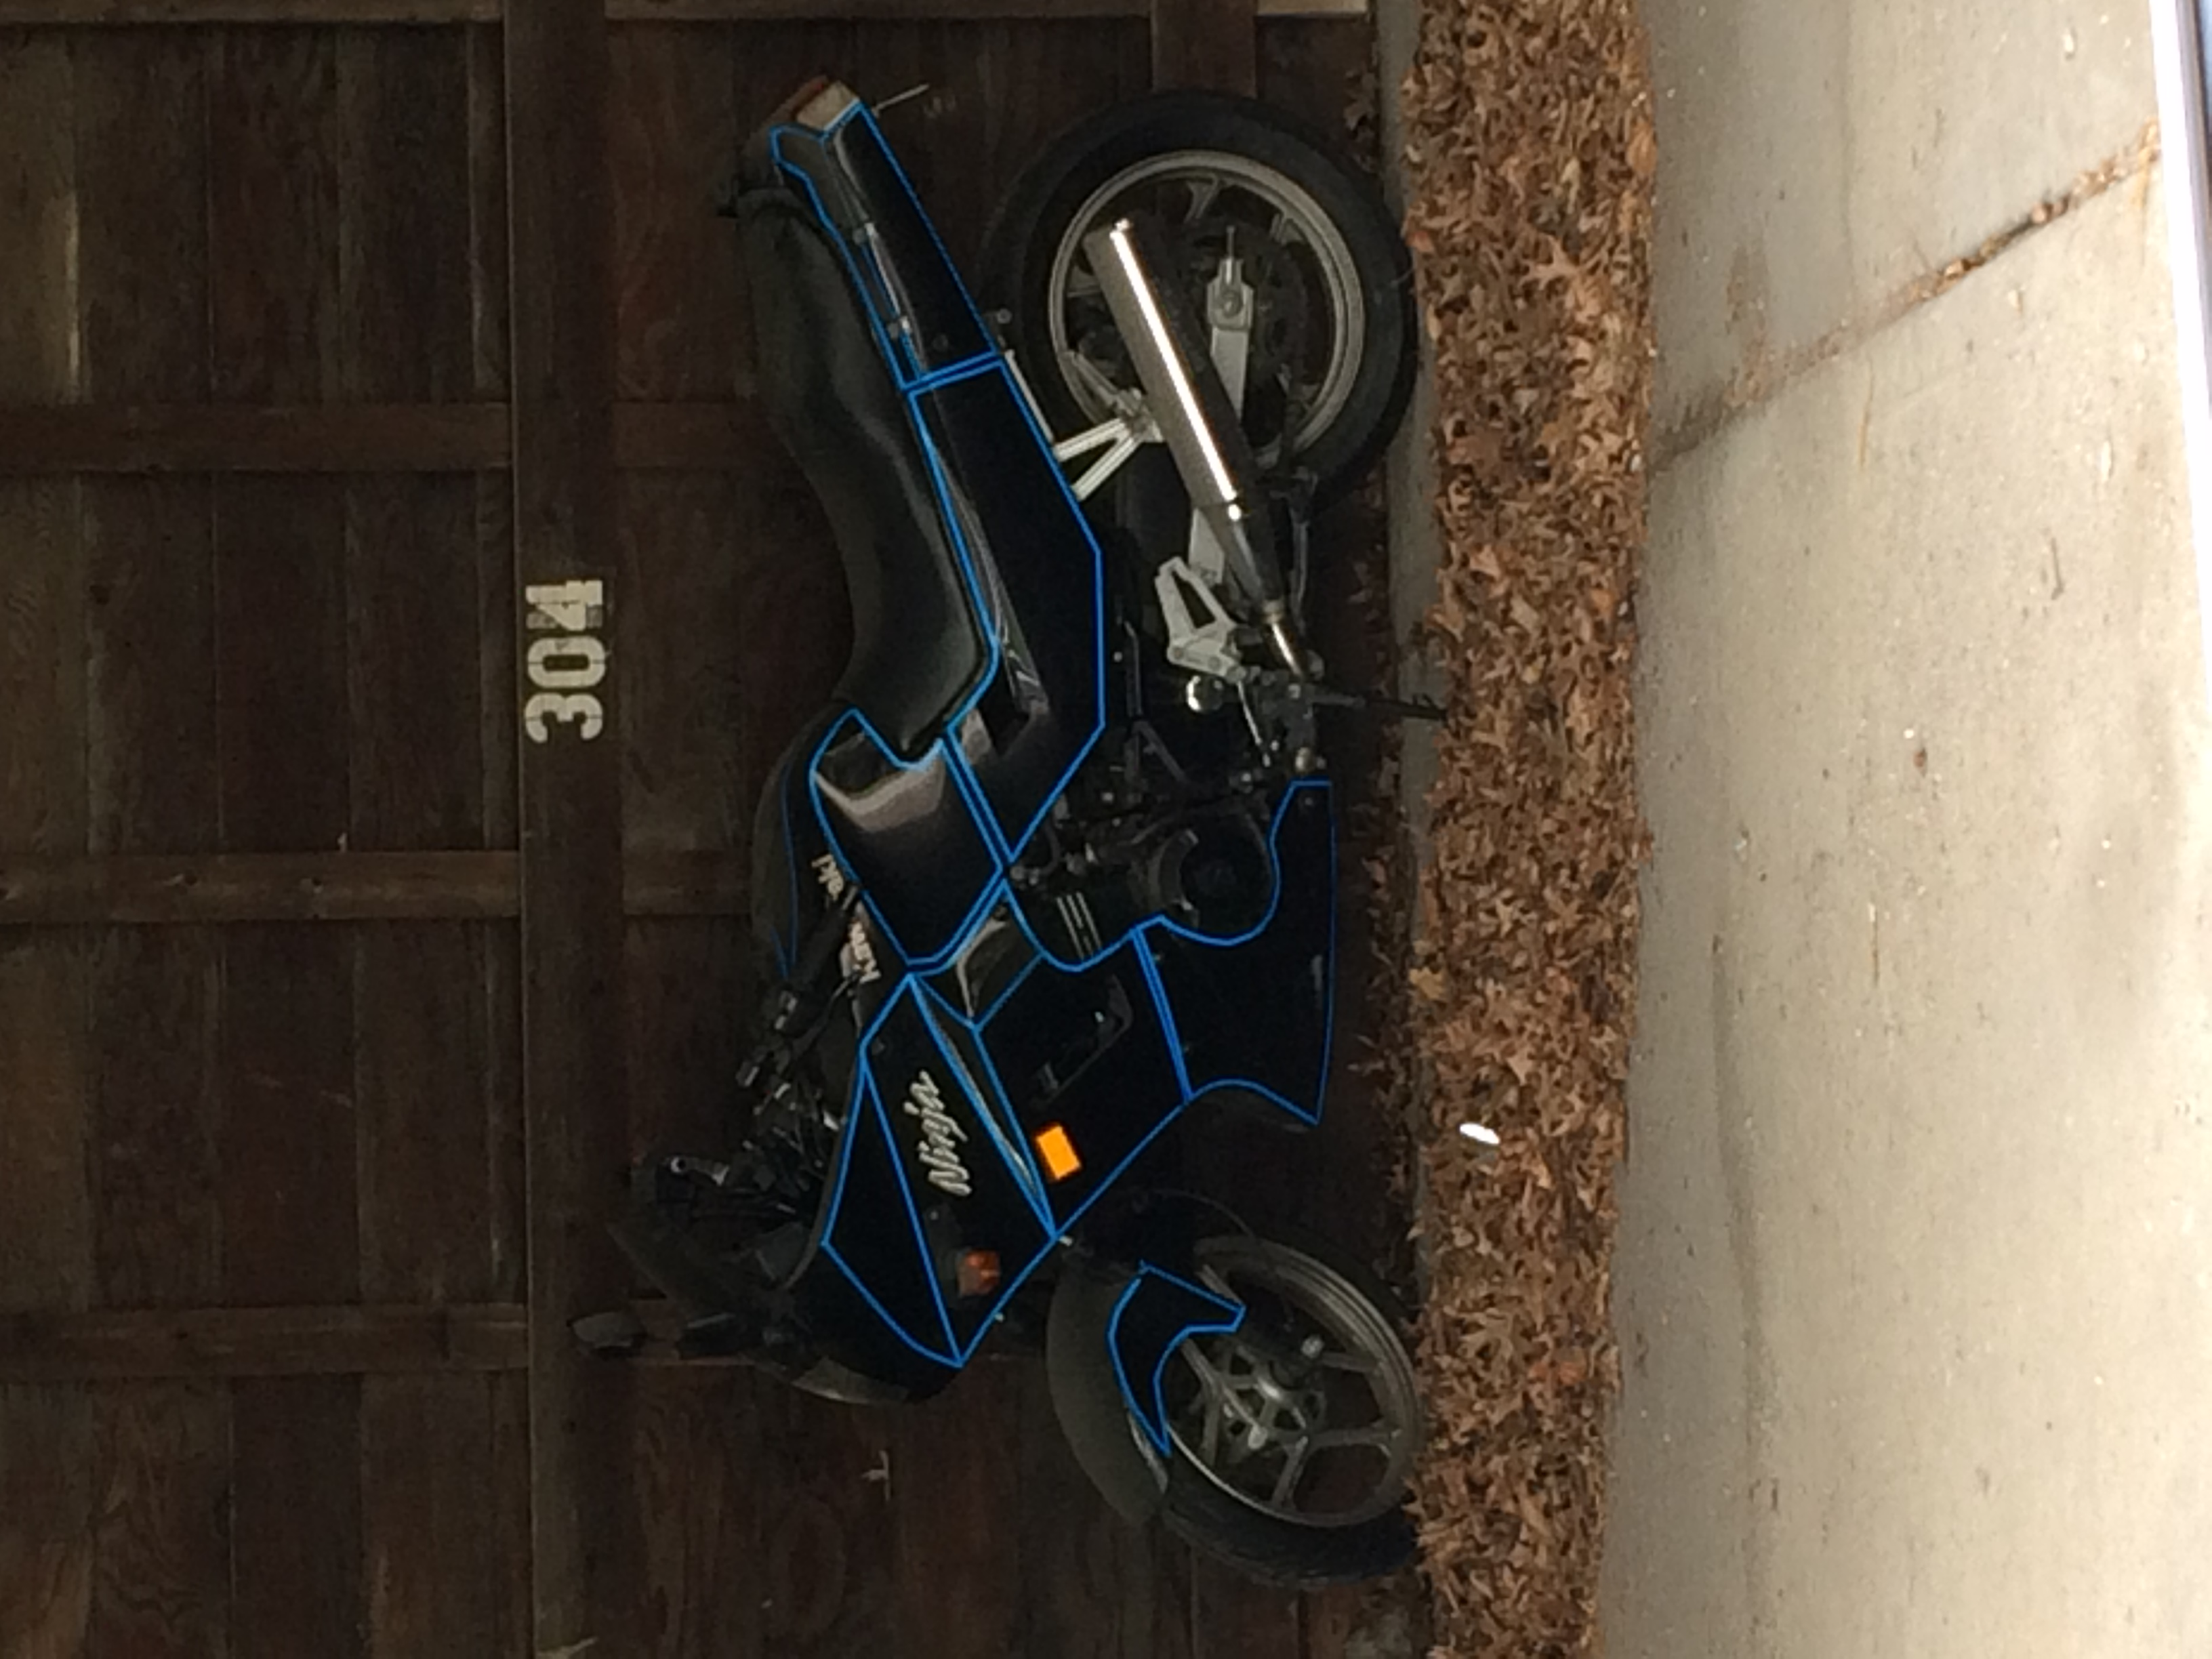 Help Identifying Bike-img_1246.jpg